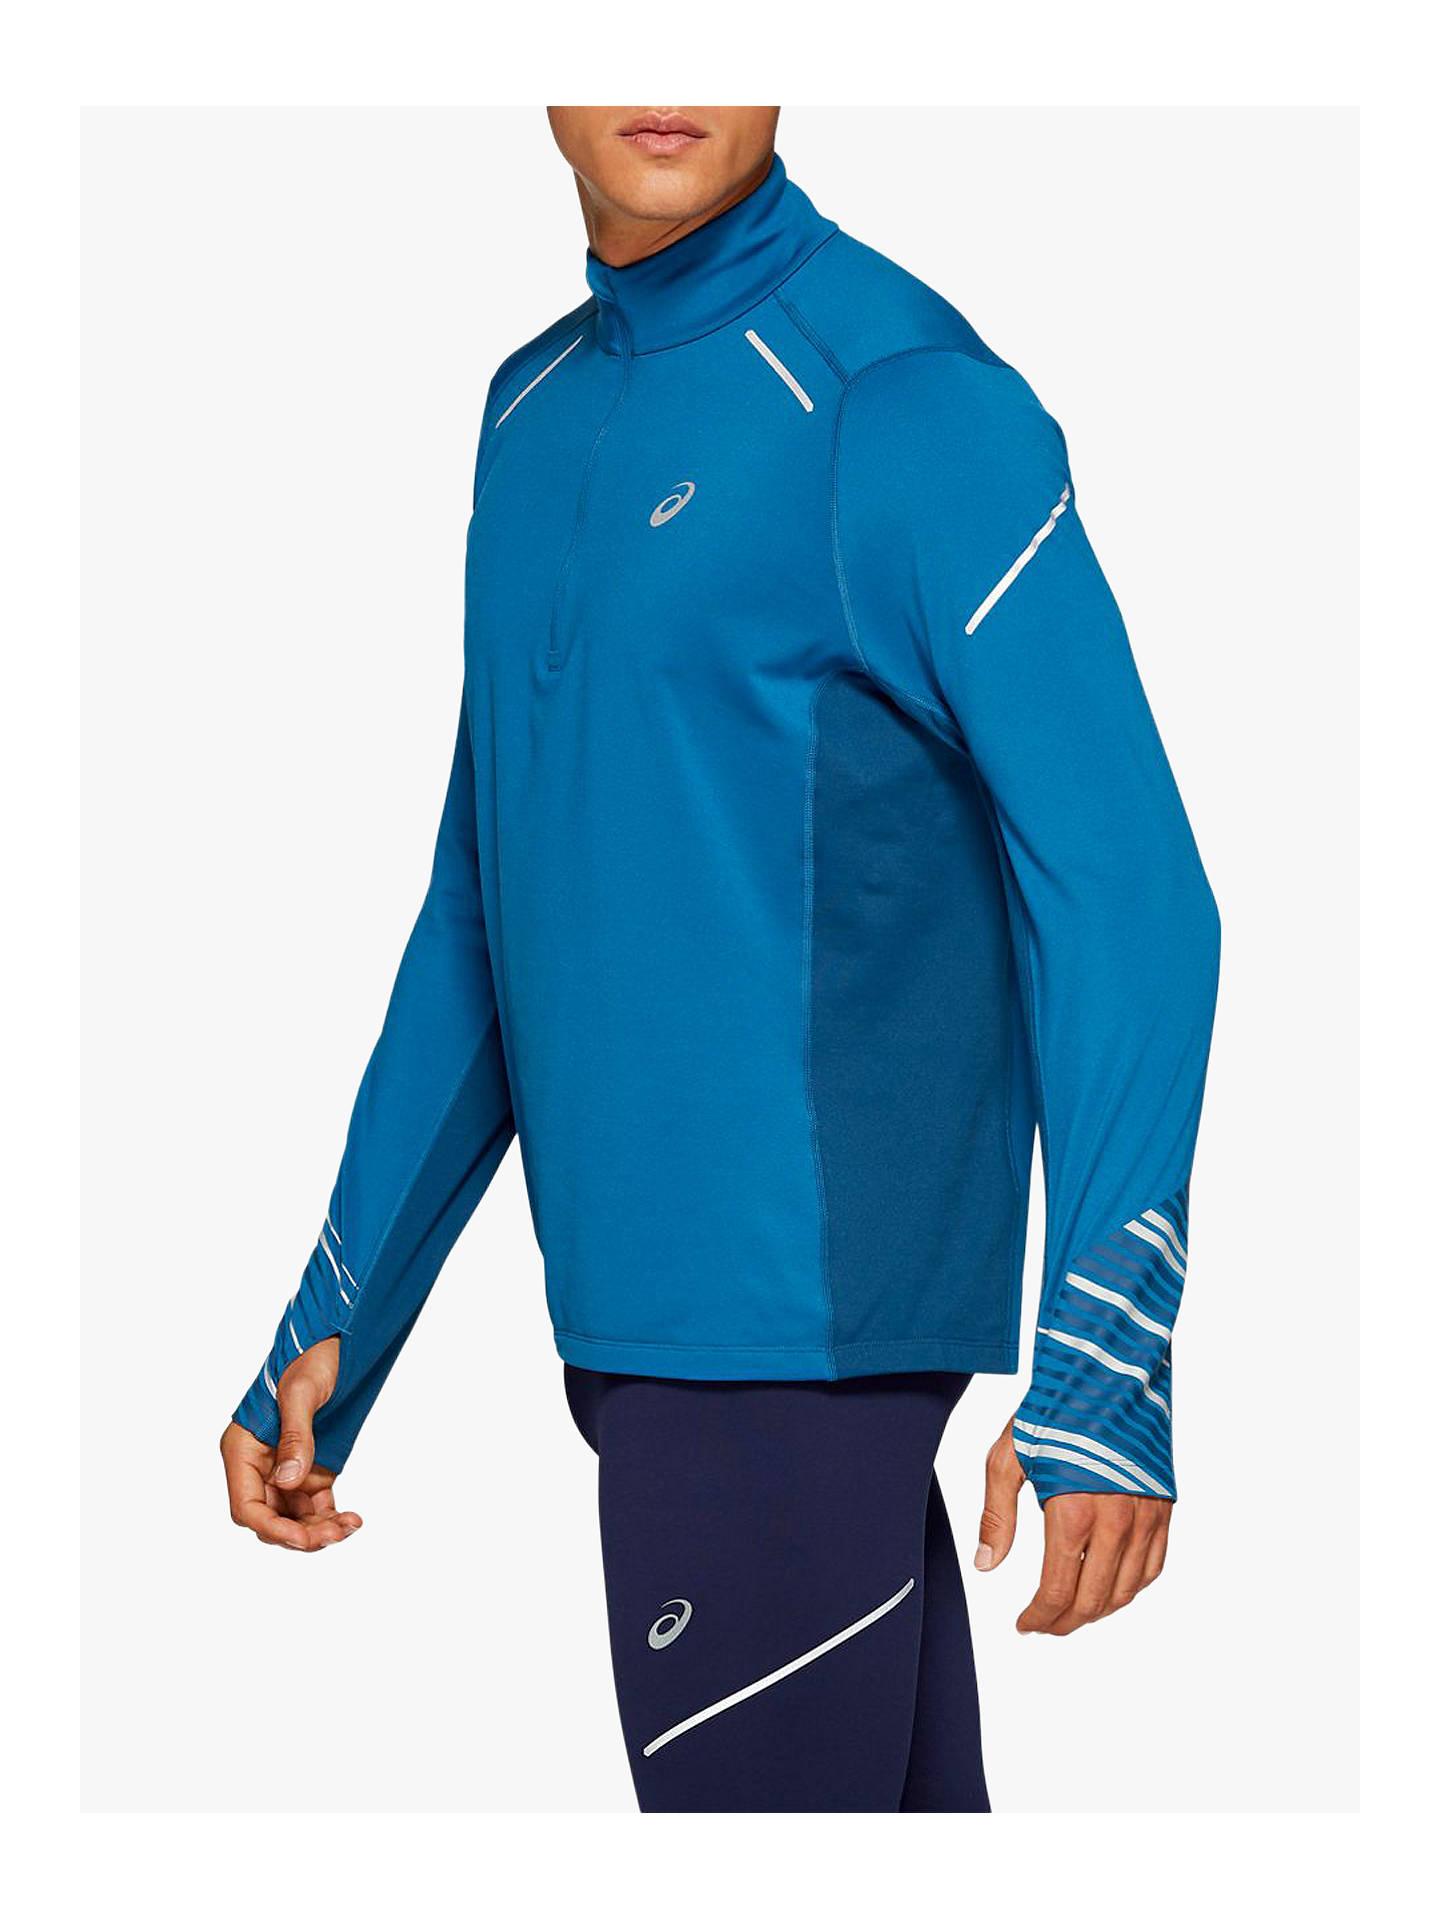 Blue ASICS Half Zip Long Sleeve Mens Running Top